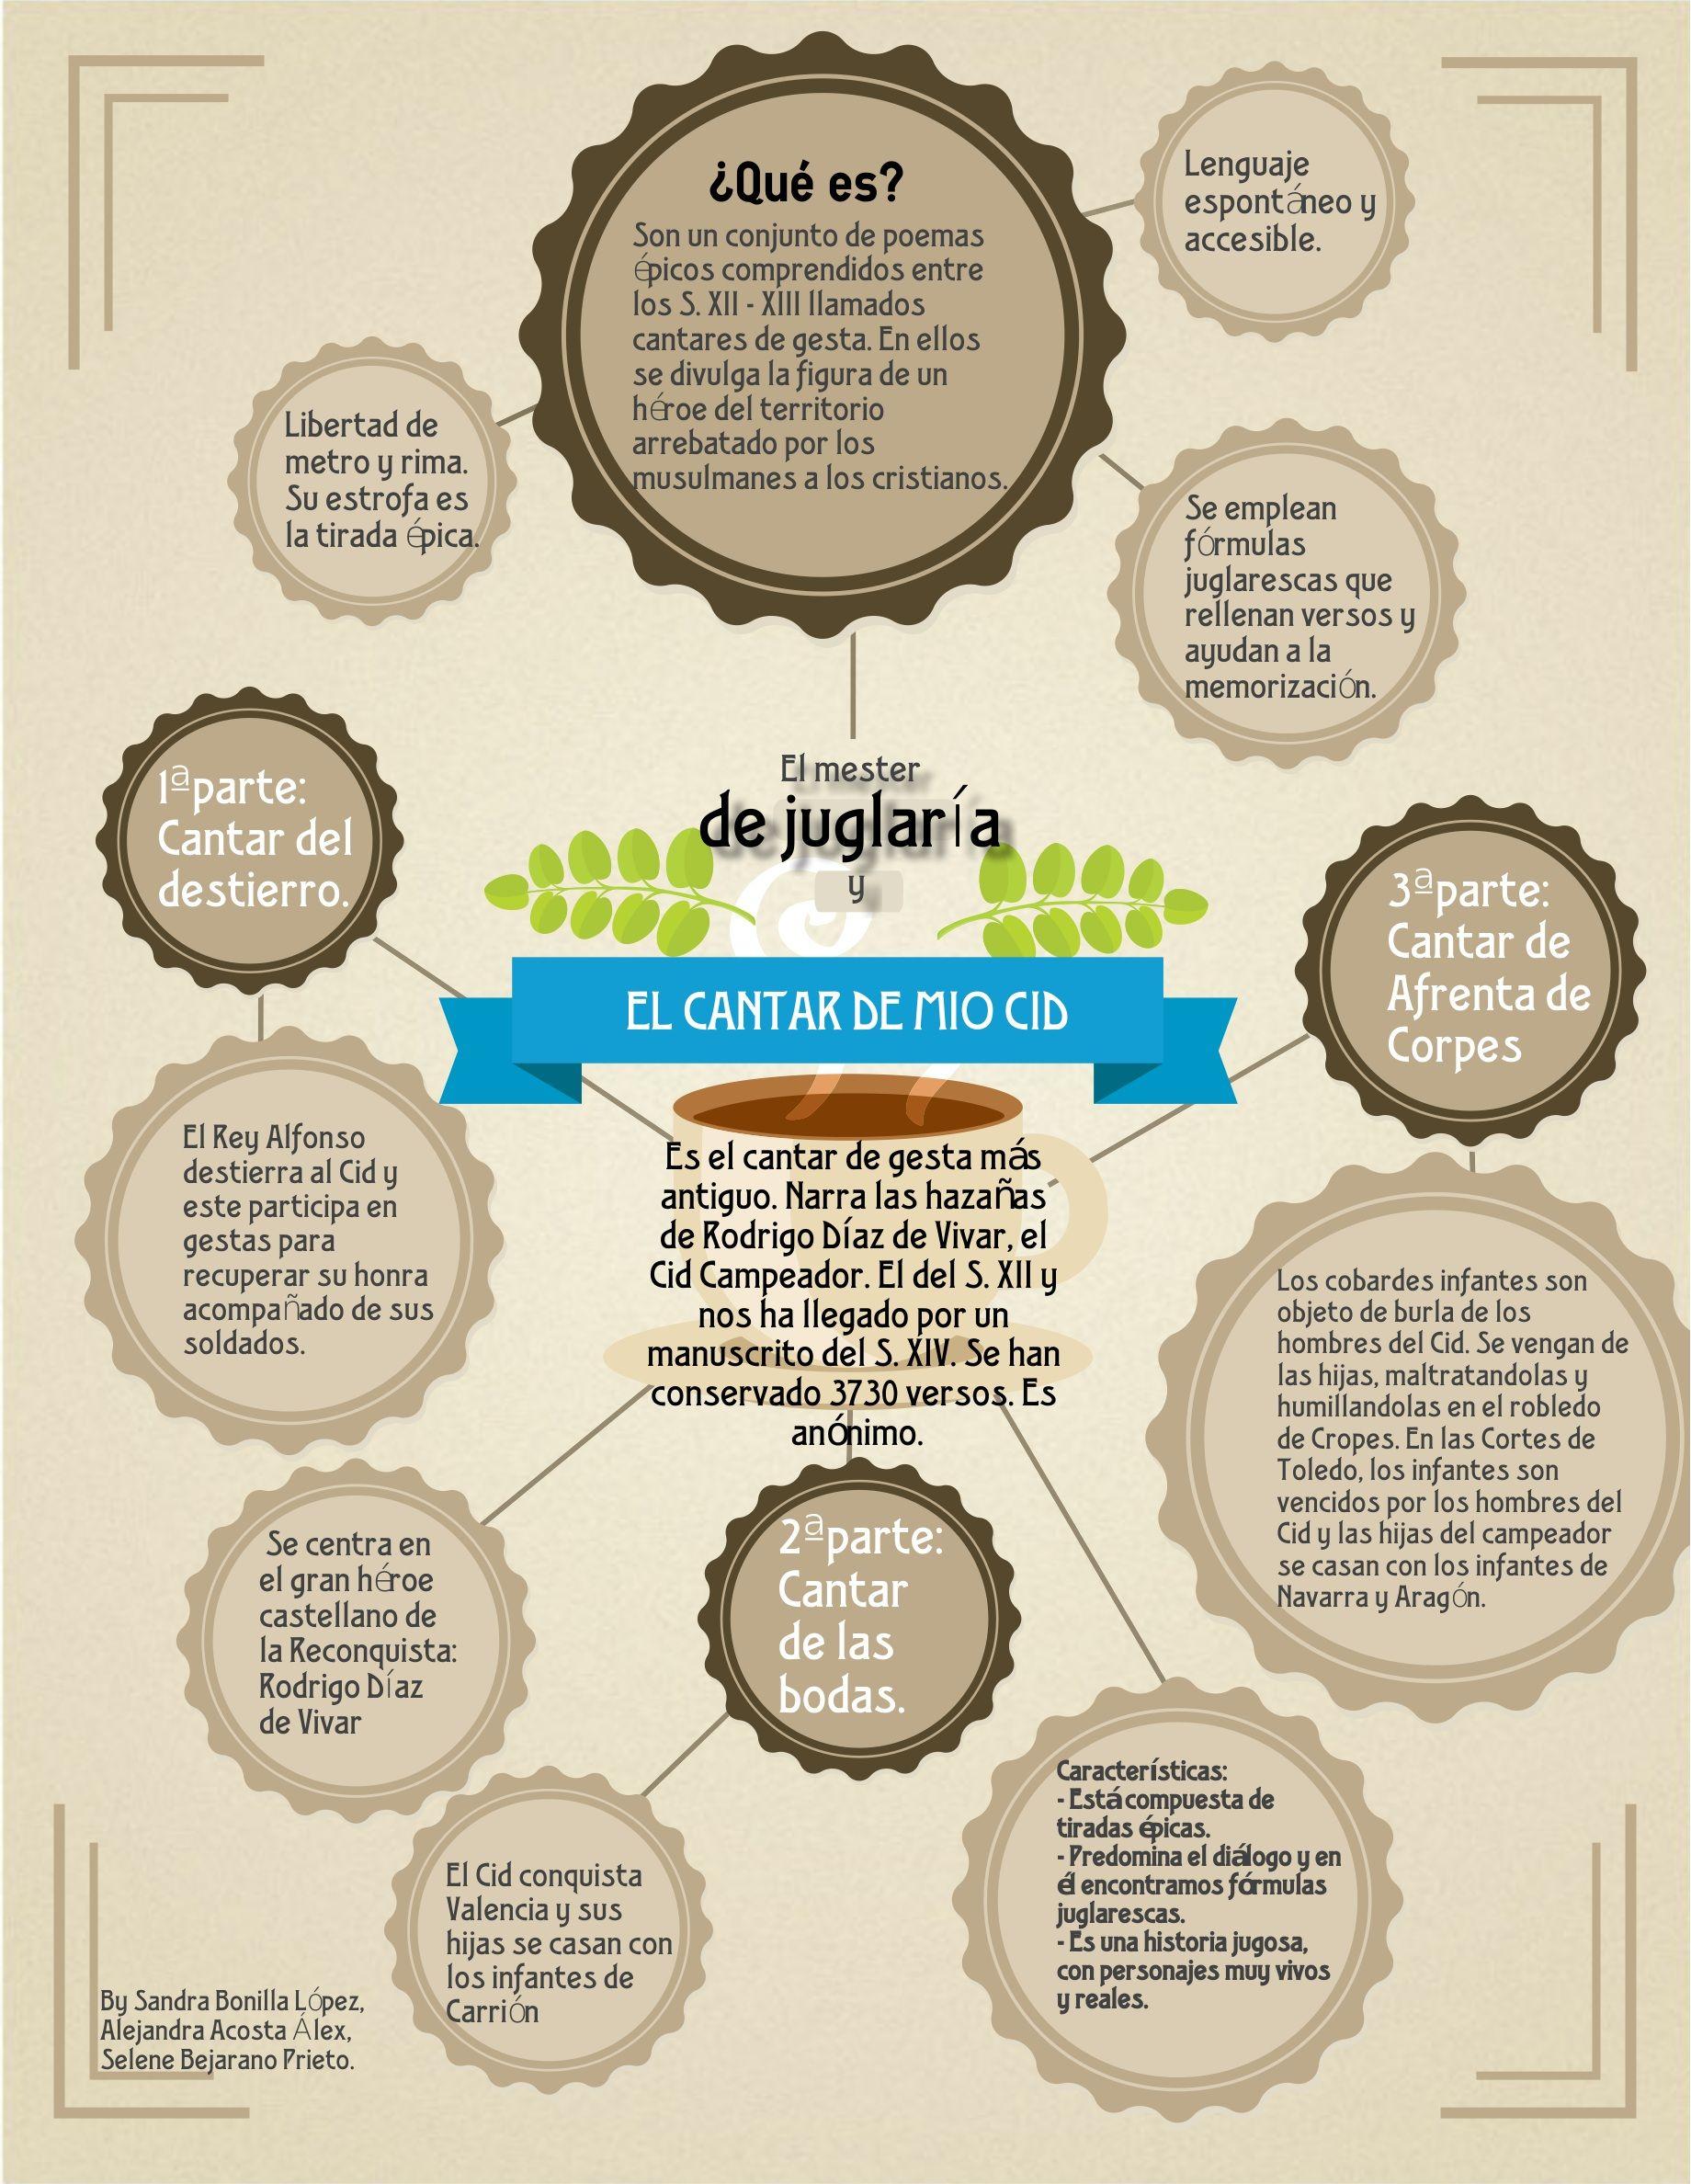 Infografías Sobre El Cantar De Mío Cid Clases De Literatura Apuntes De Lengua Ortografia Basica